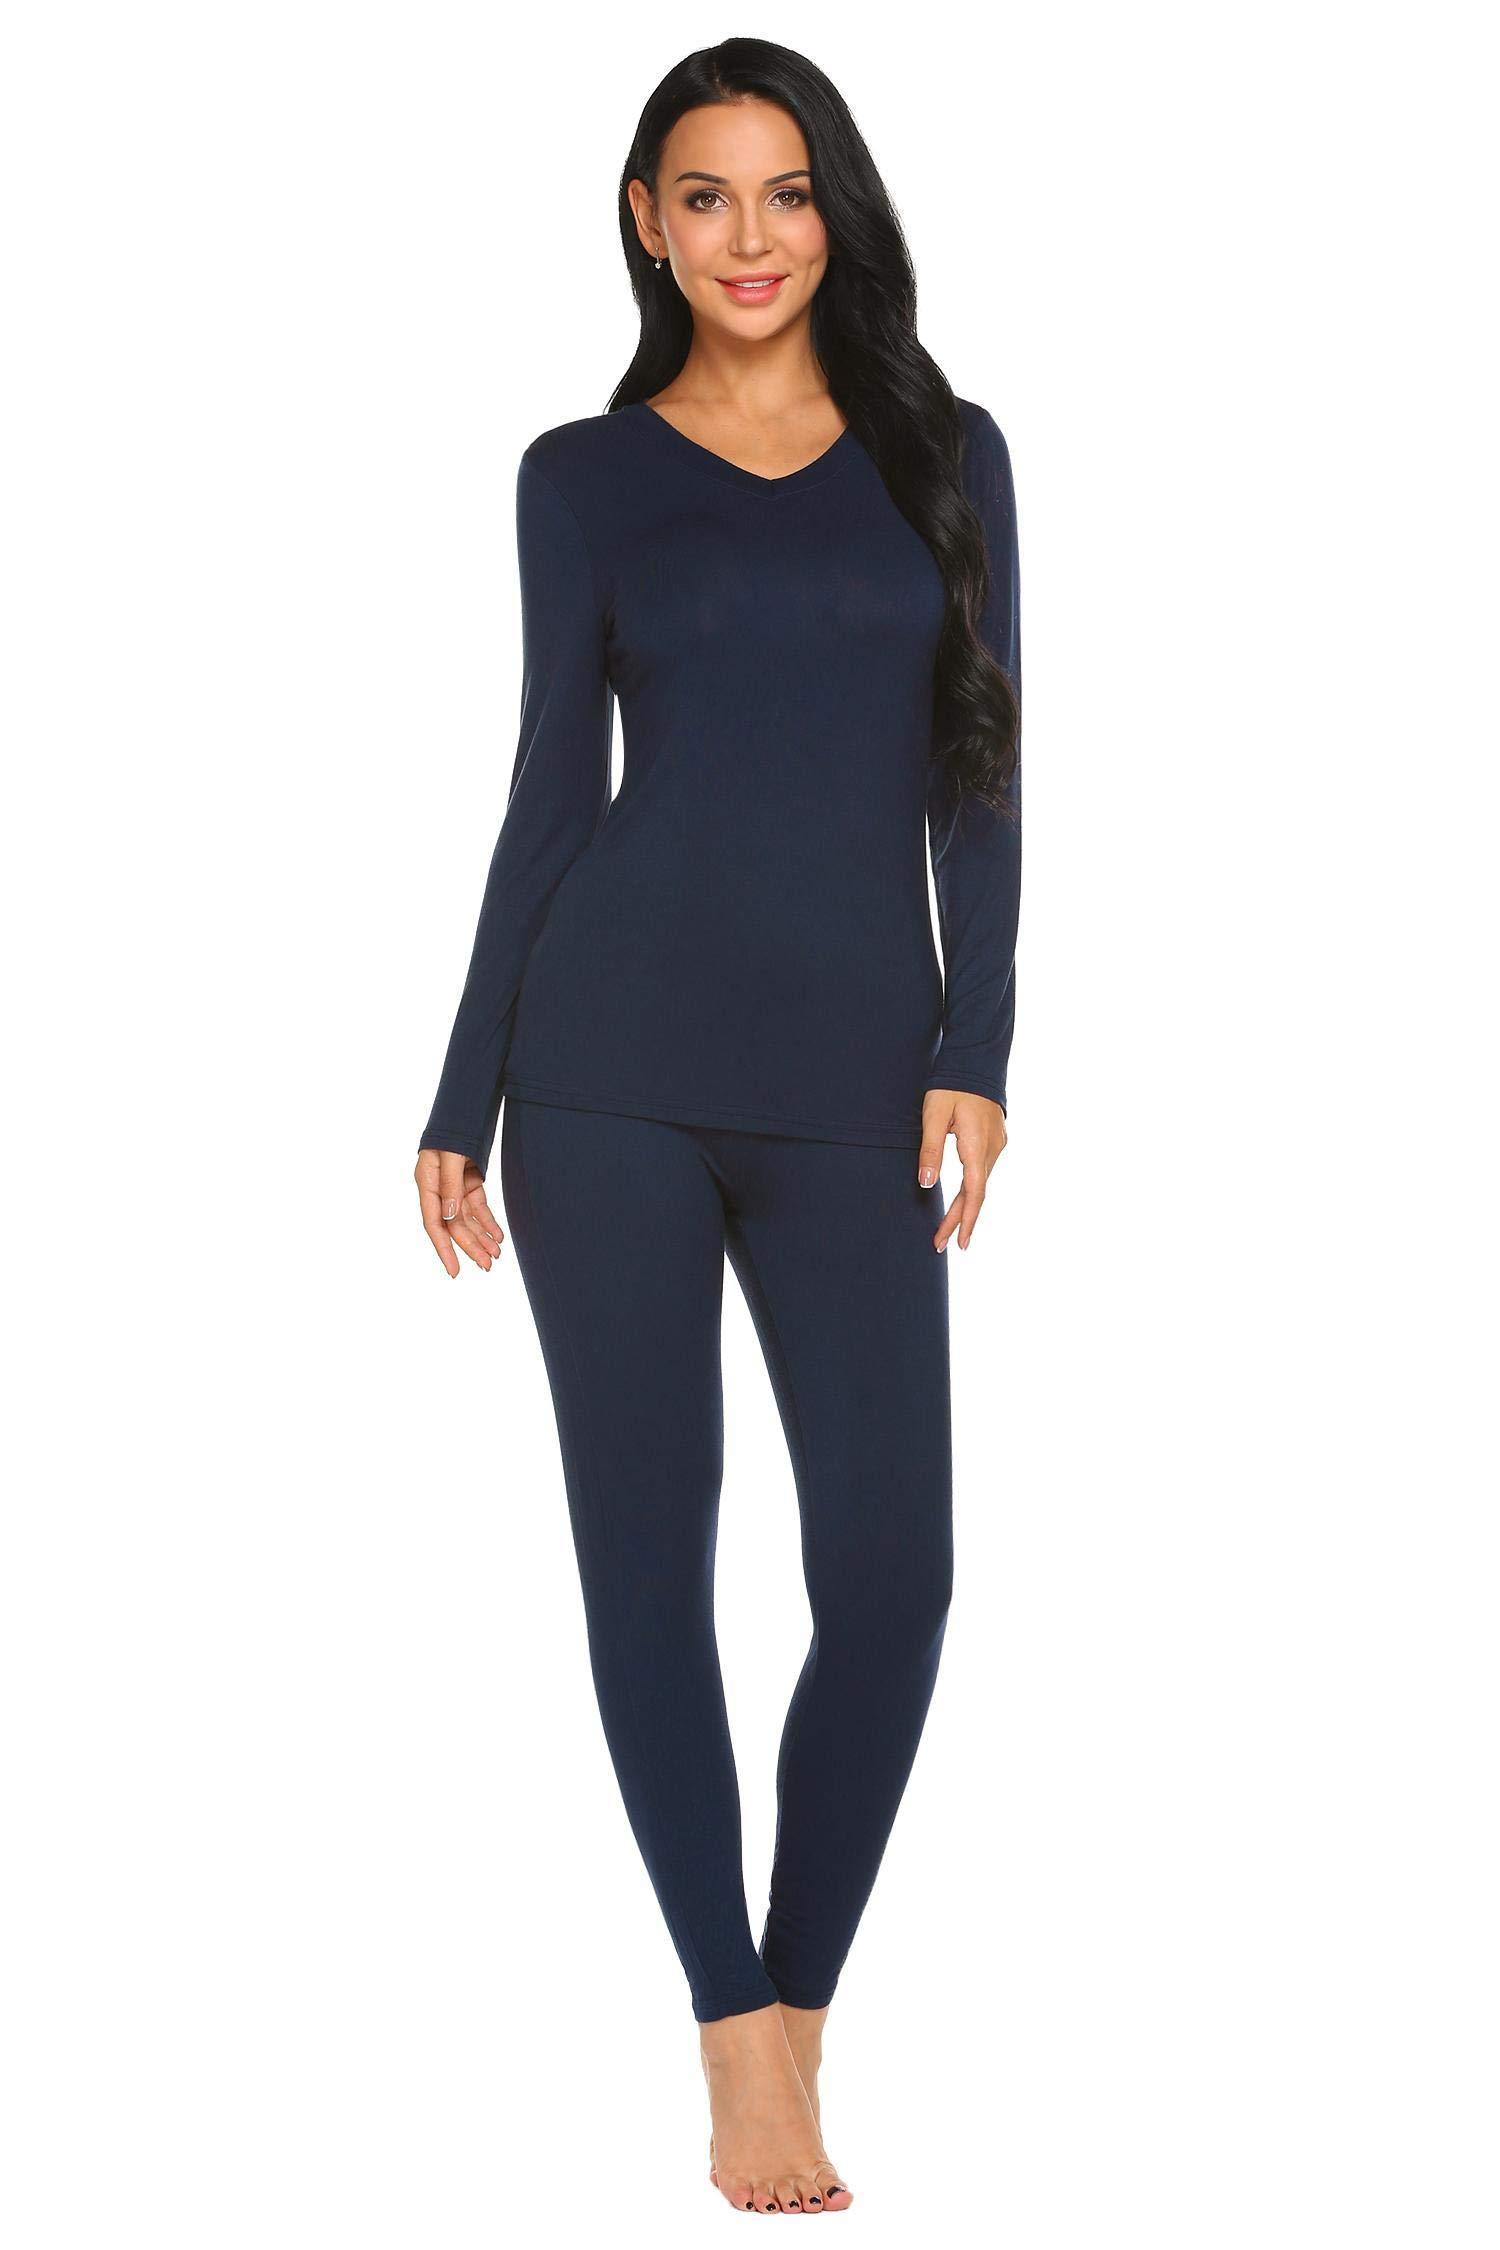 Ekouaer Womens Thermal Underwear Top & Bottom Set with Fleece Lined